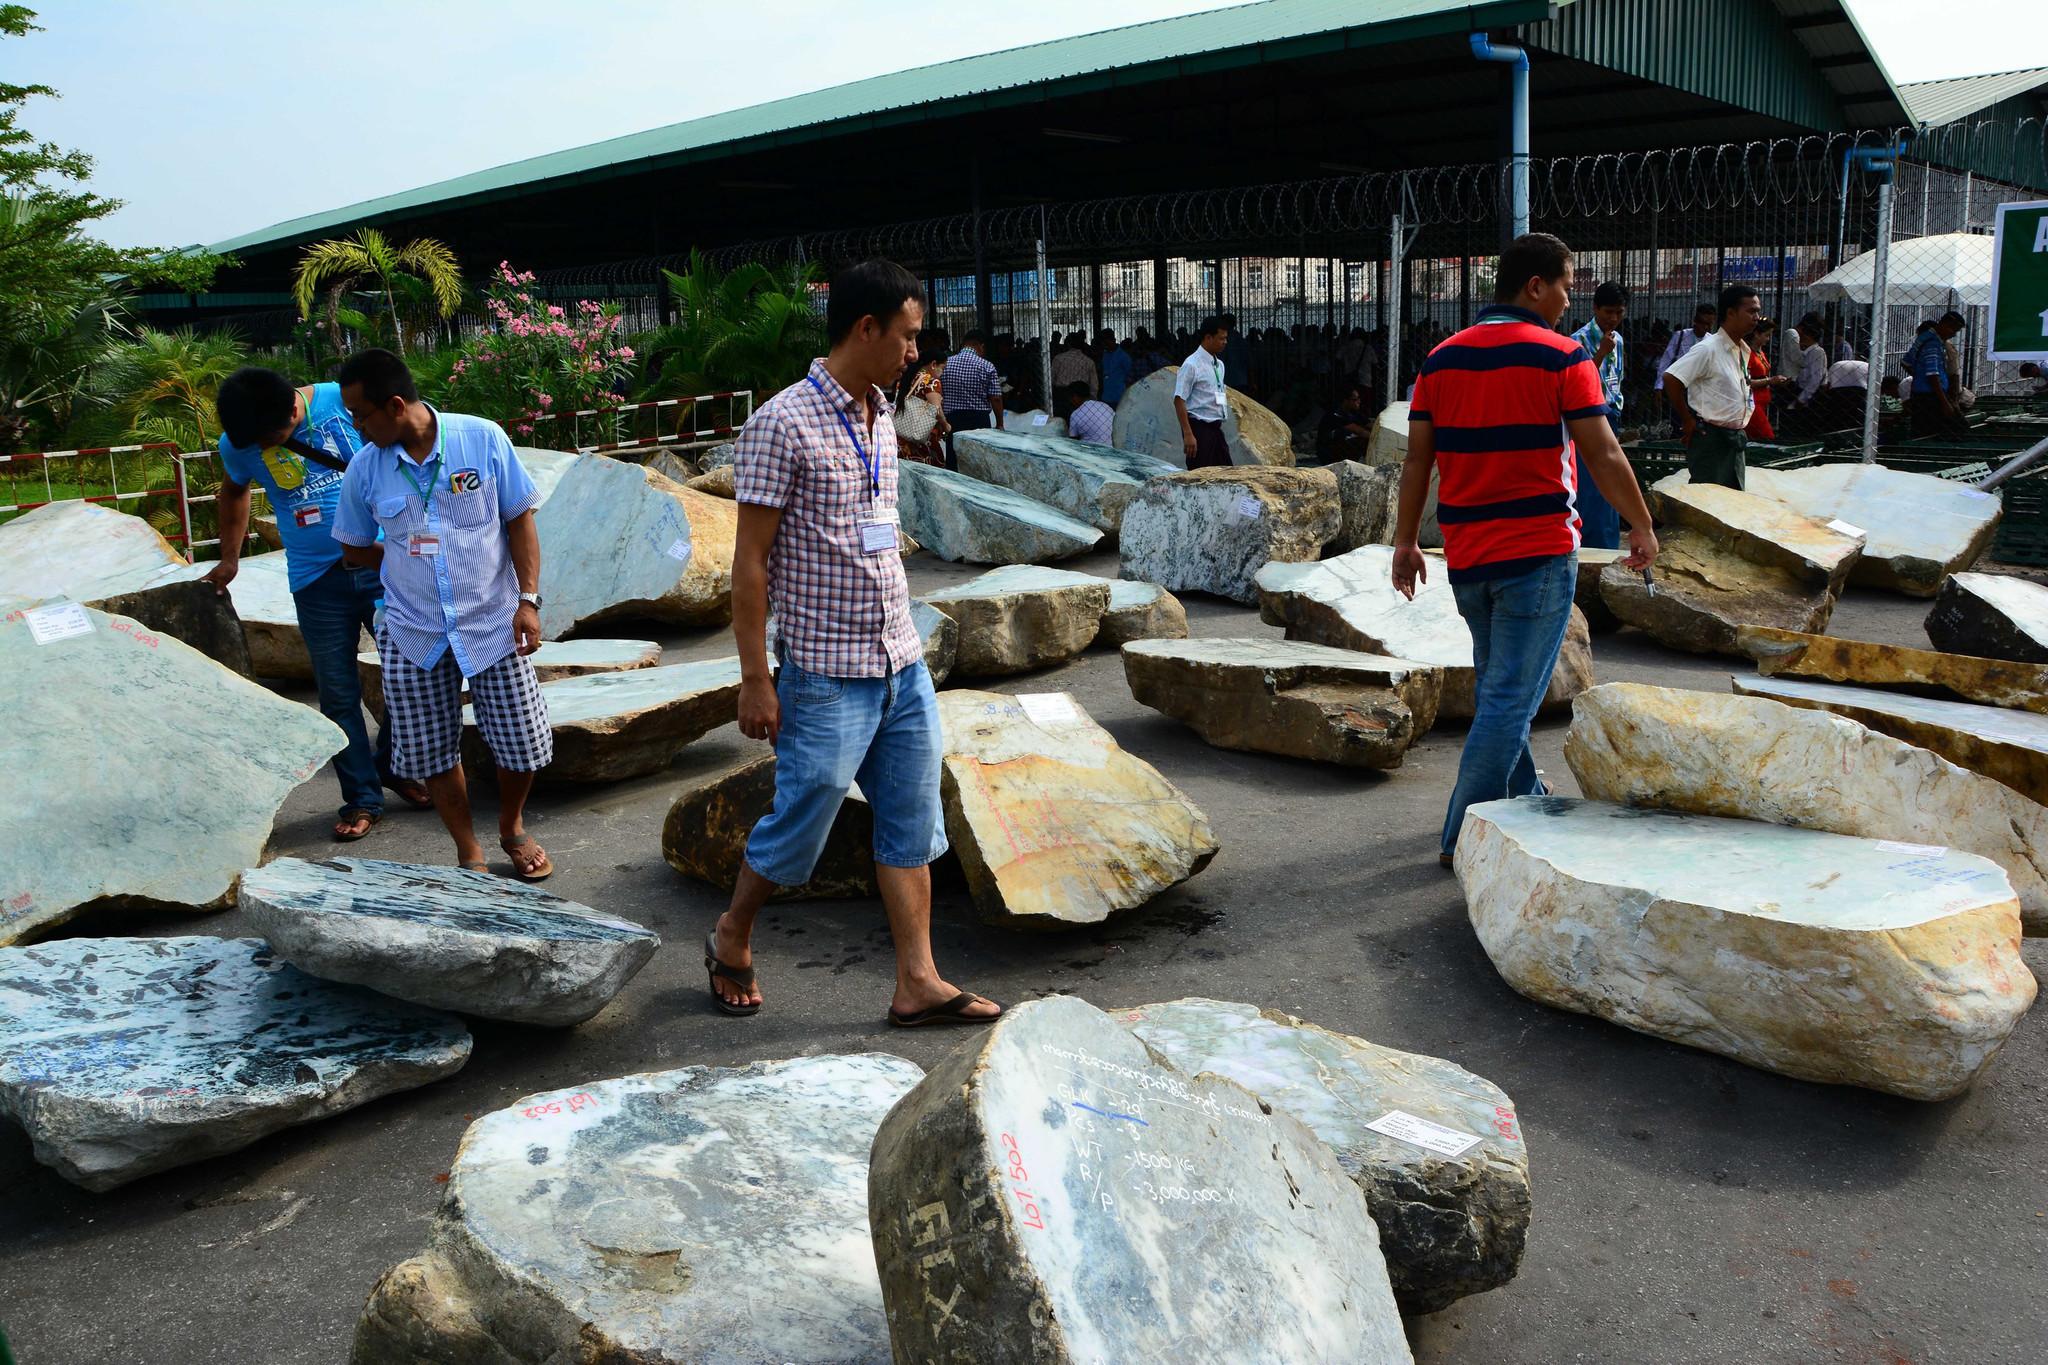 Capital Region Cars >> Myanmar jade rush muddies promise of change, fuels conflict - Chicago Tribune